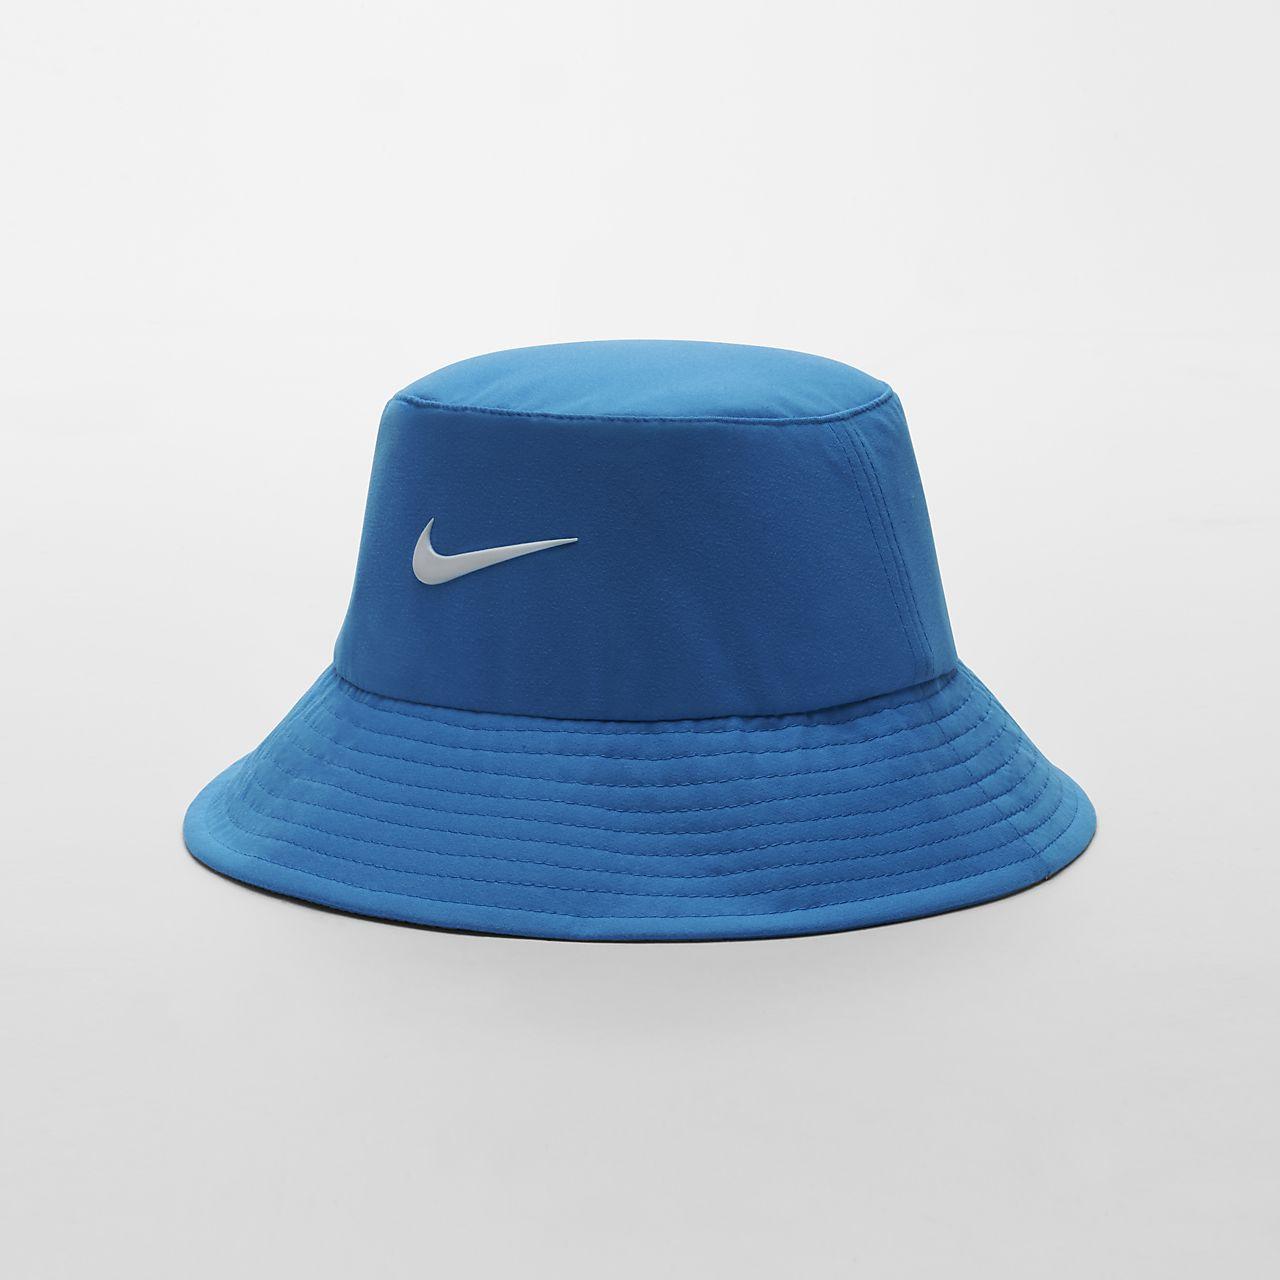 5d35466629c Nike Dri-FIT Toddler Bucket Hat. Nike.com BE